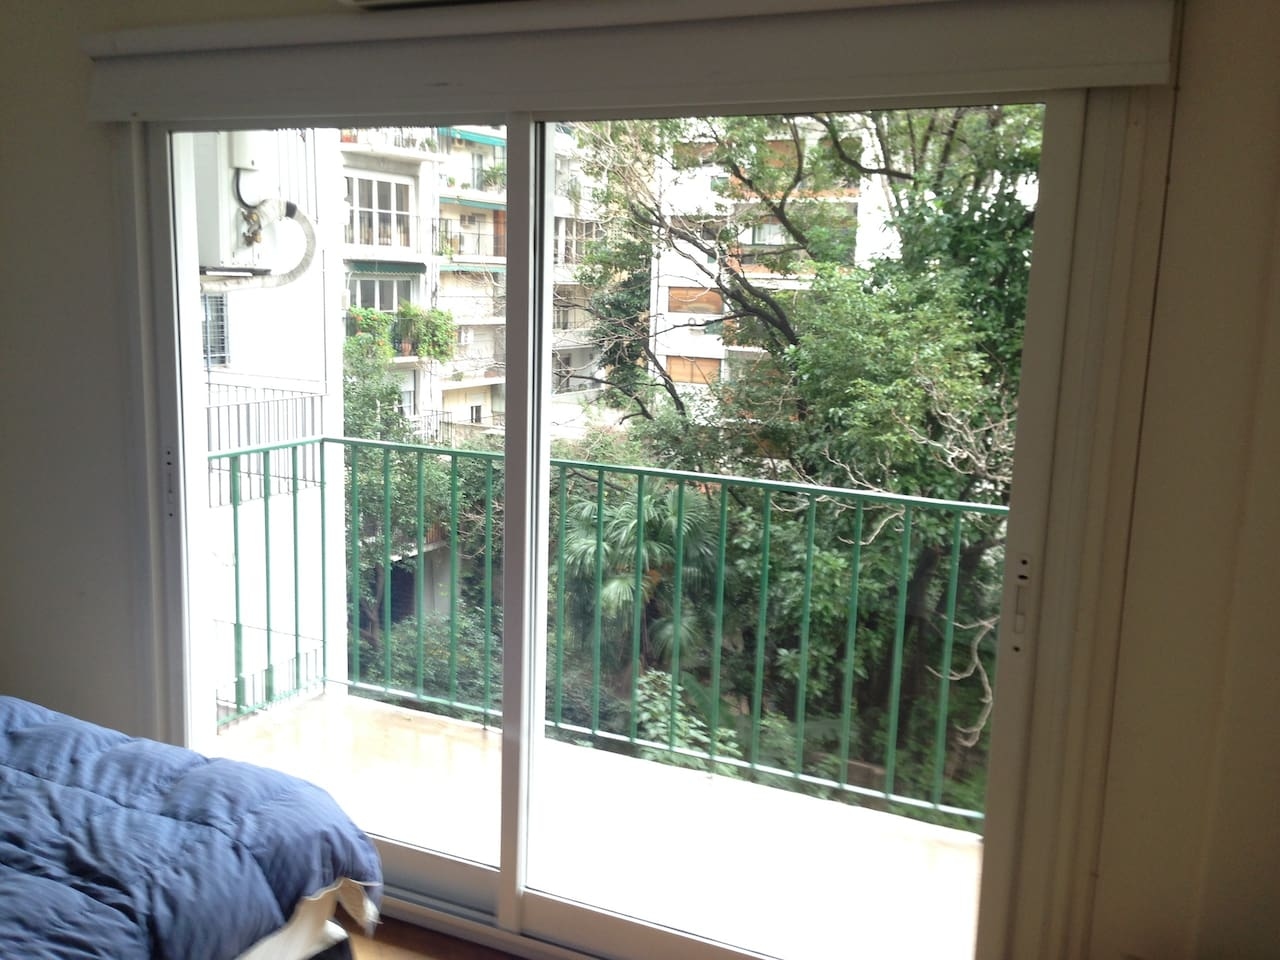 Luminous balcony on the Double bed room